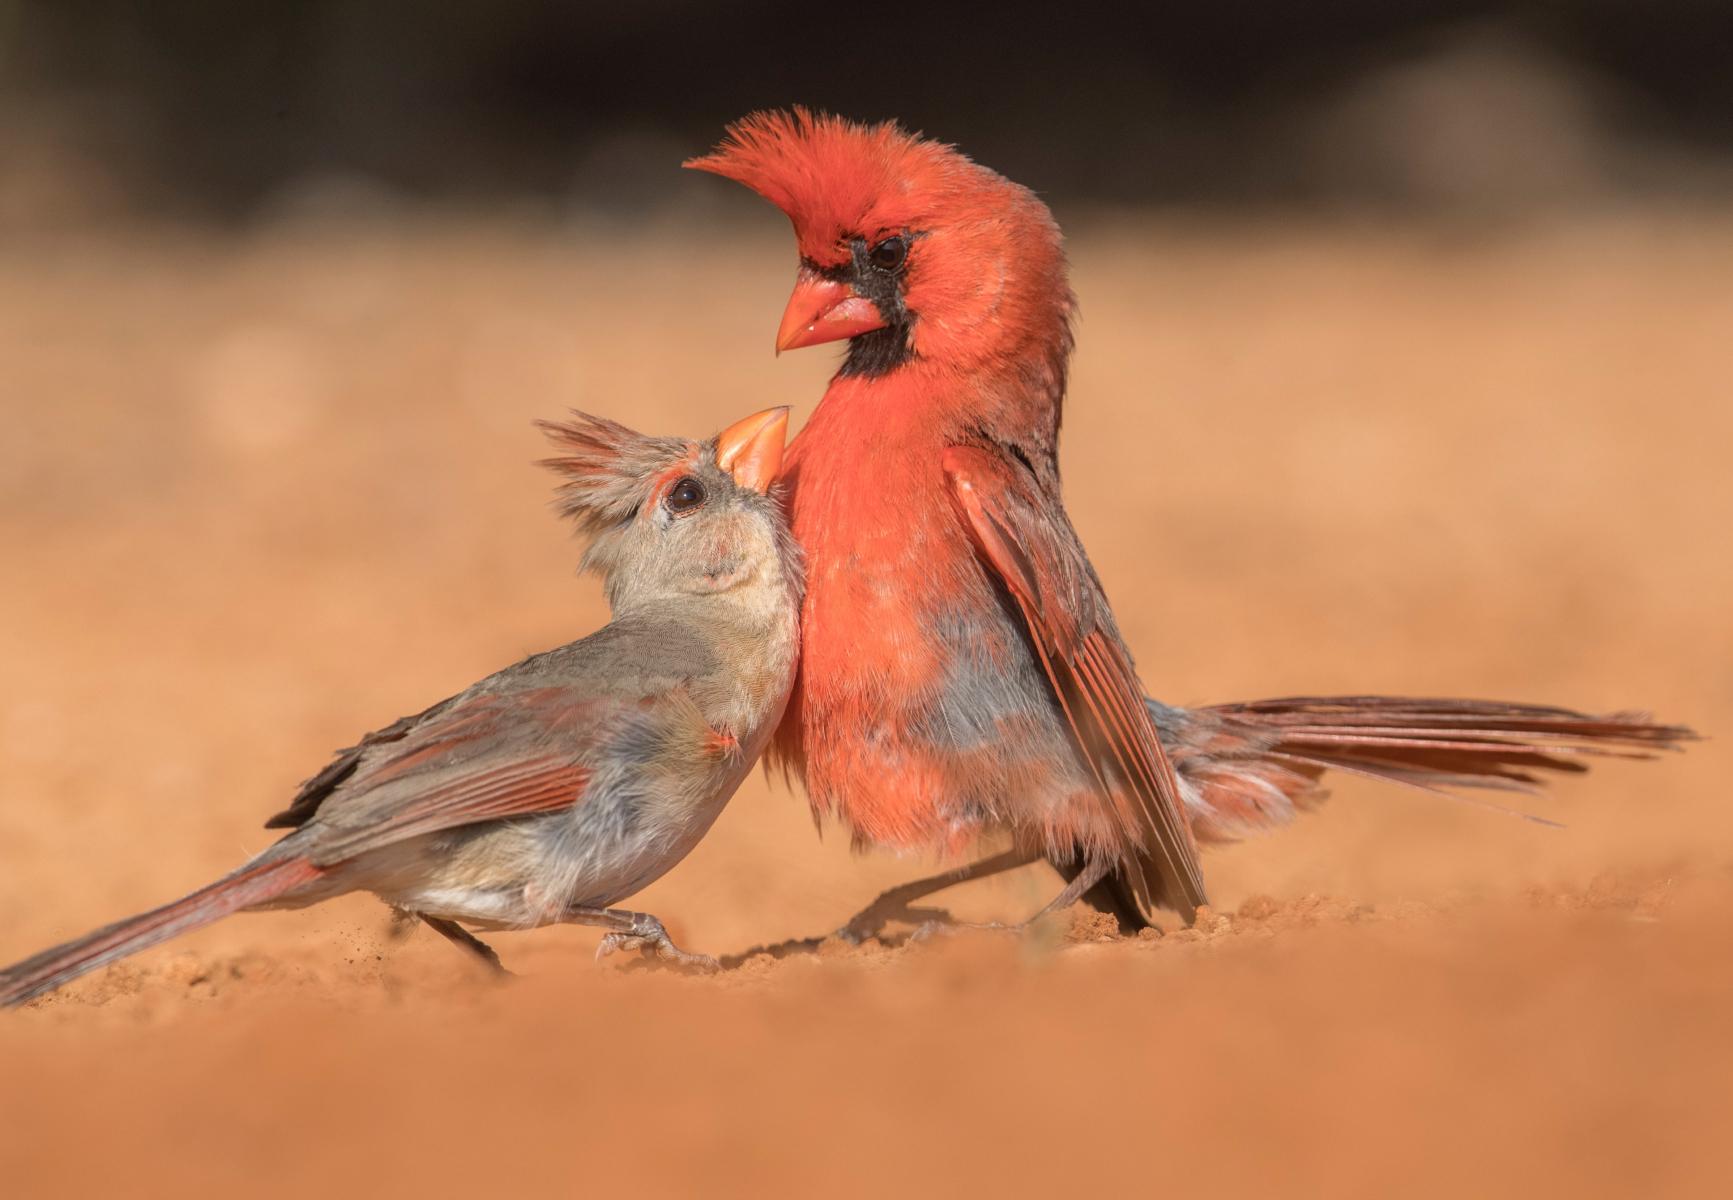 Third place: Northern Cardinals